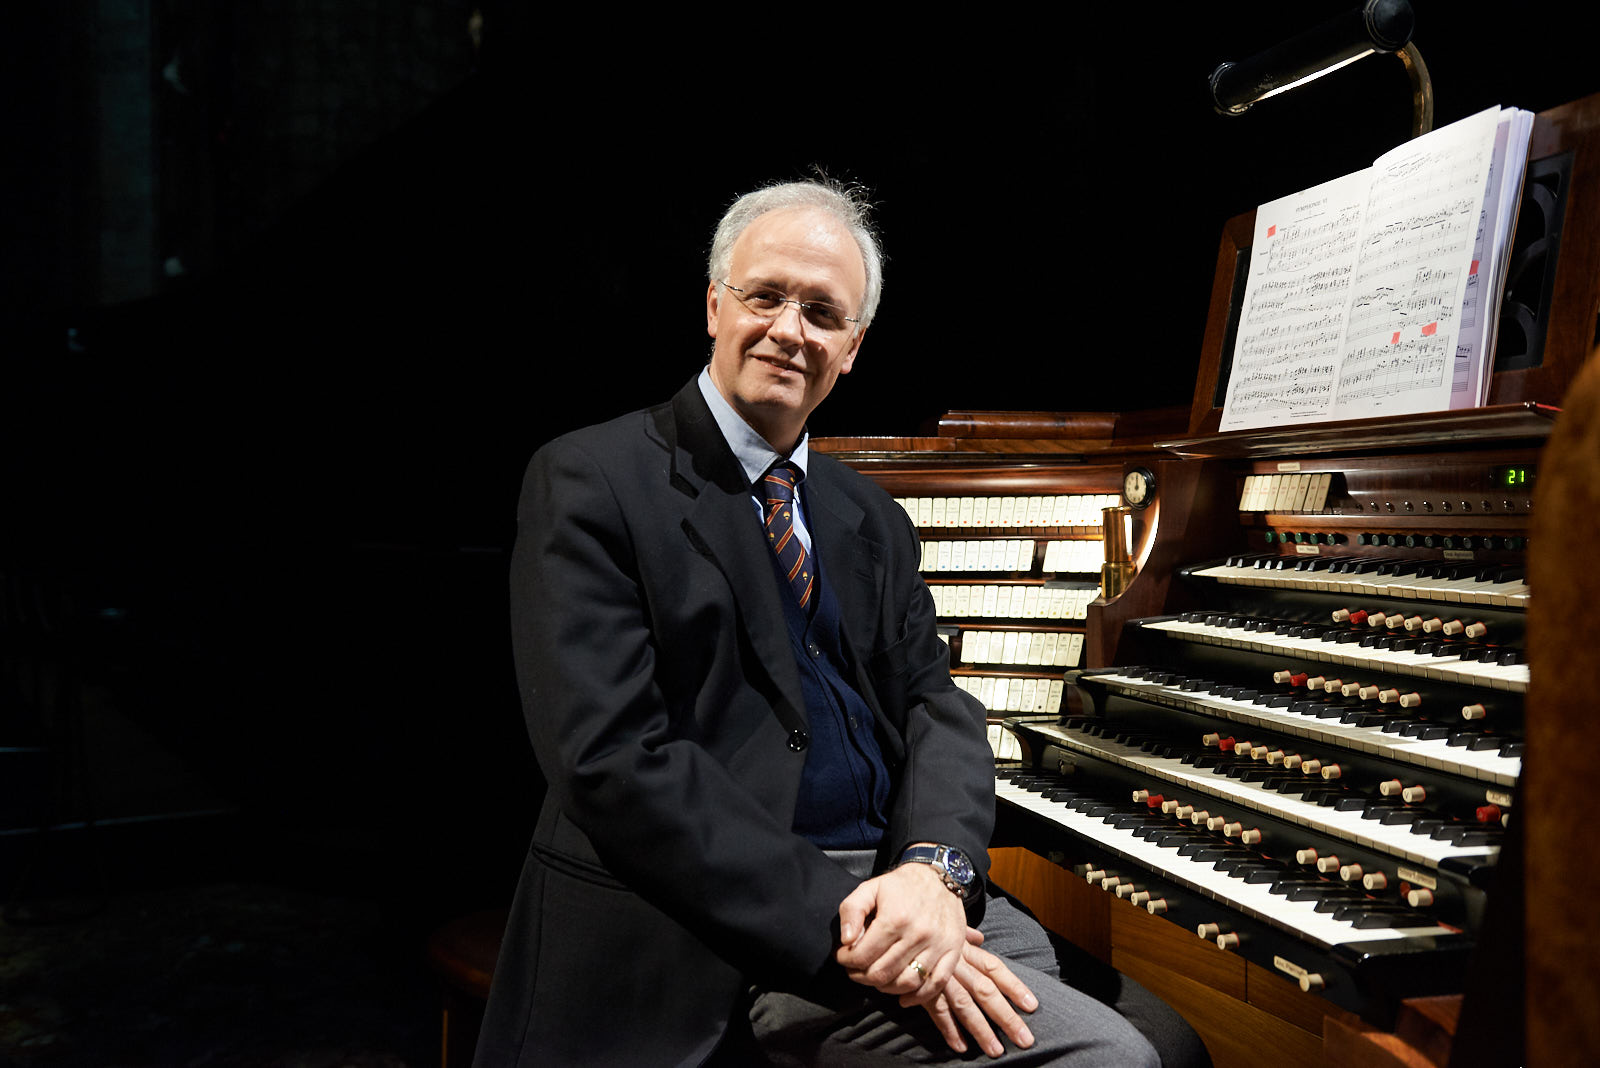 Emanuele Carlo Vianelli